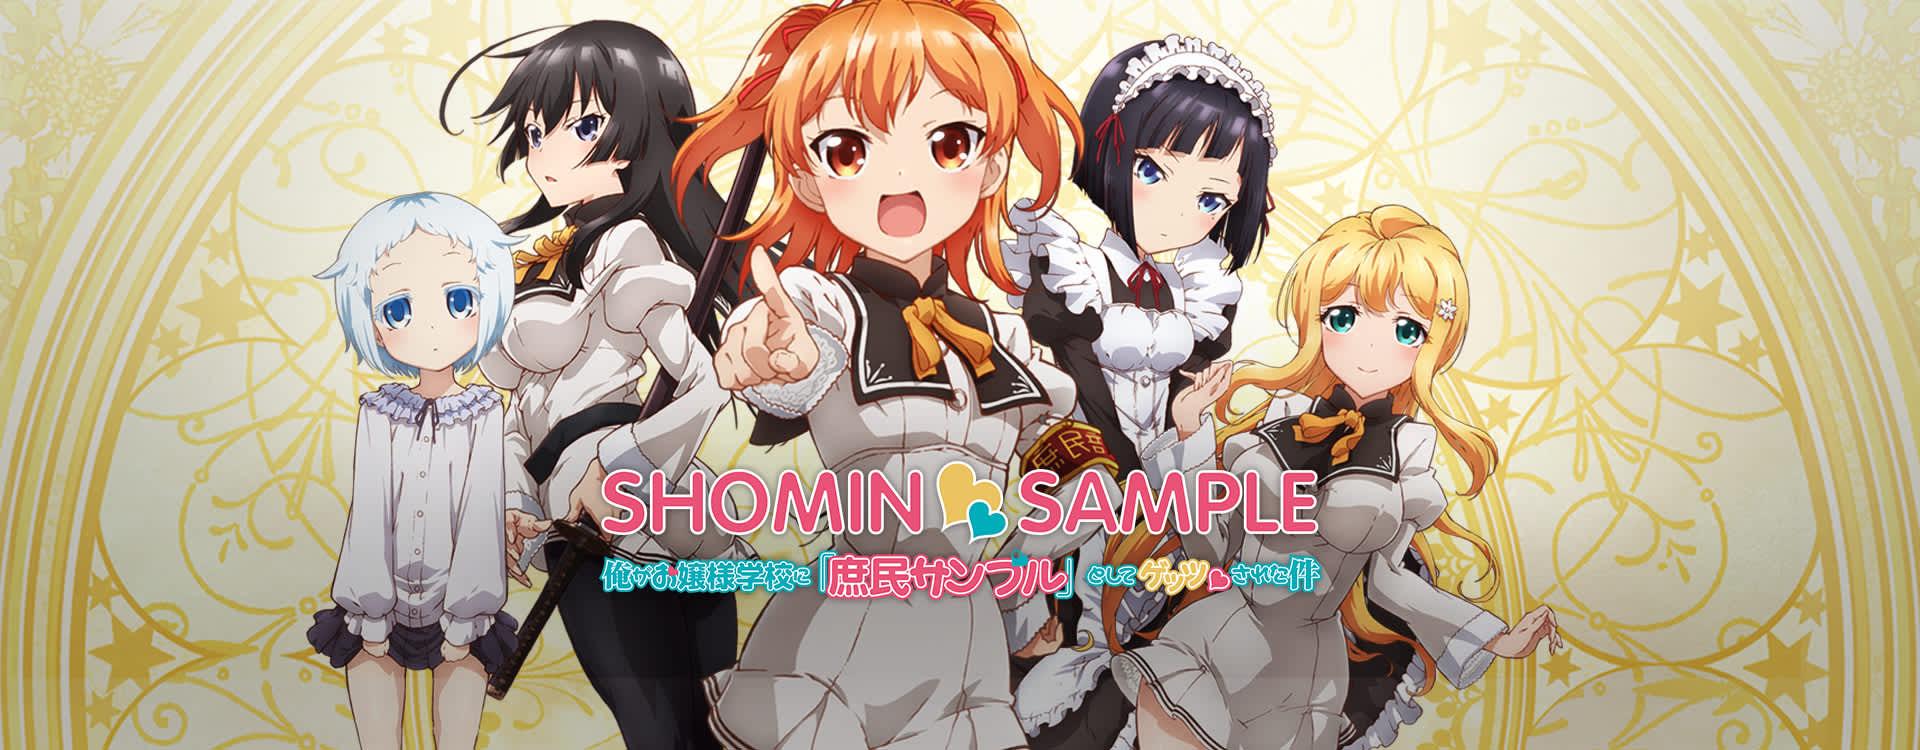 shomin sample